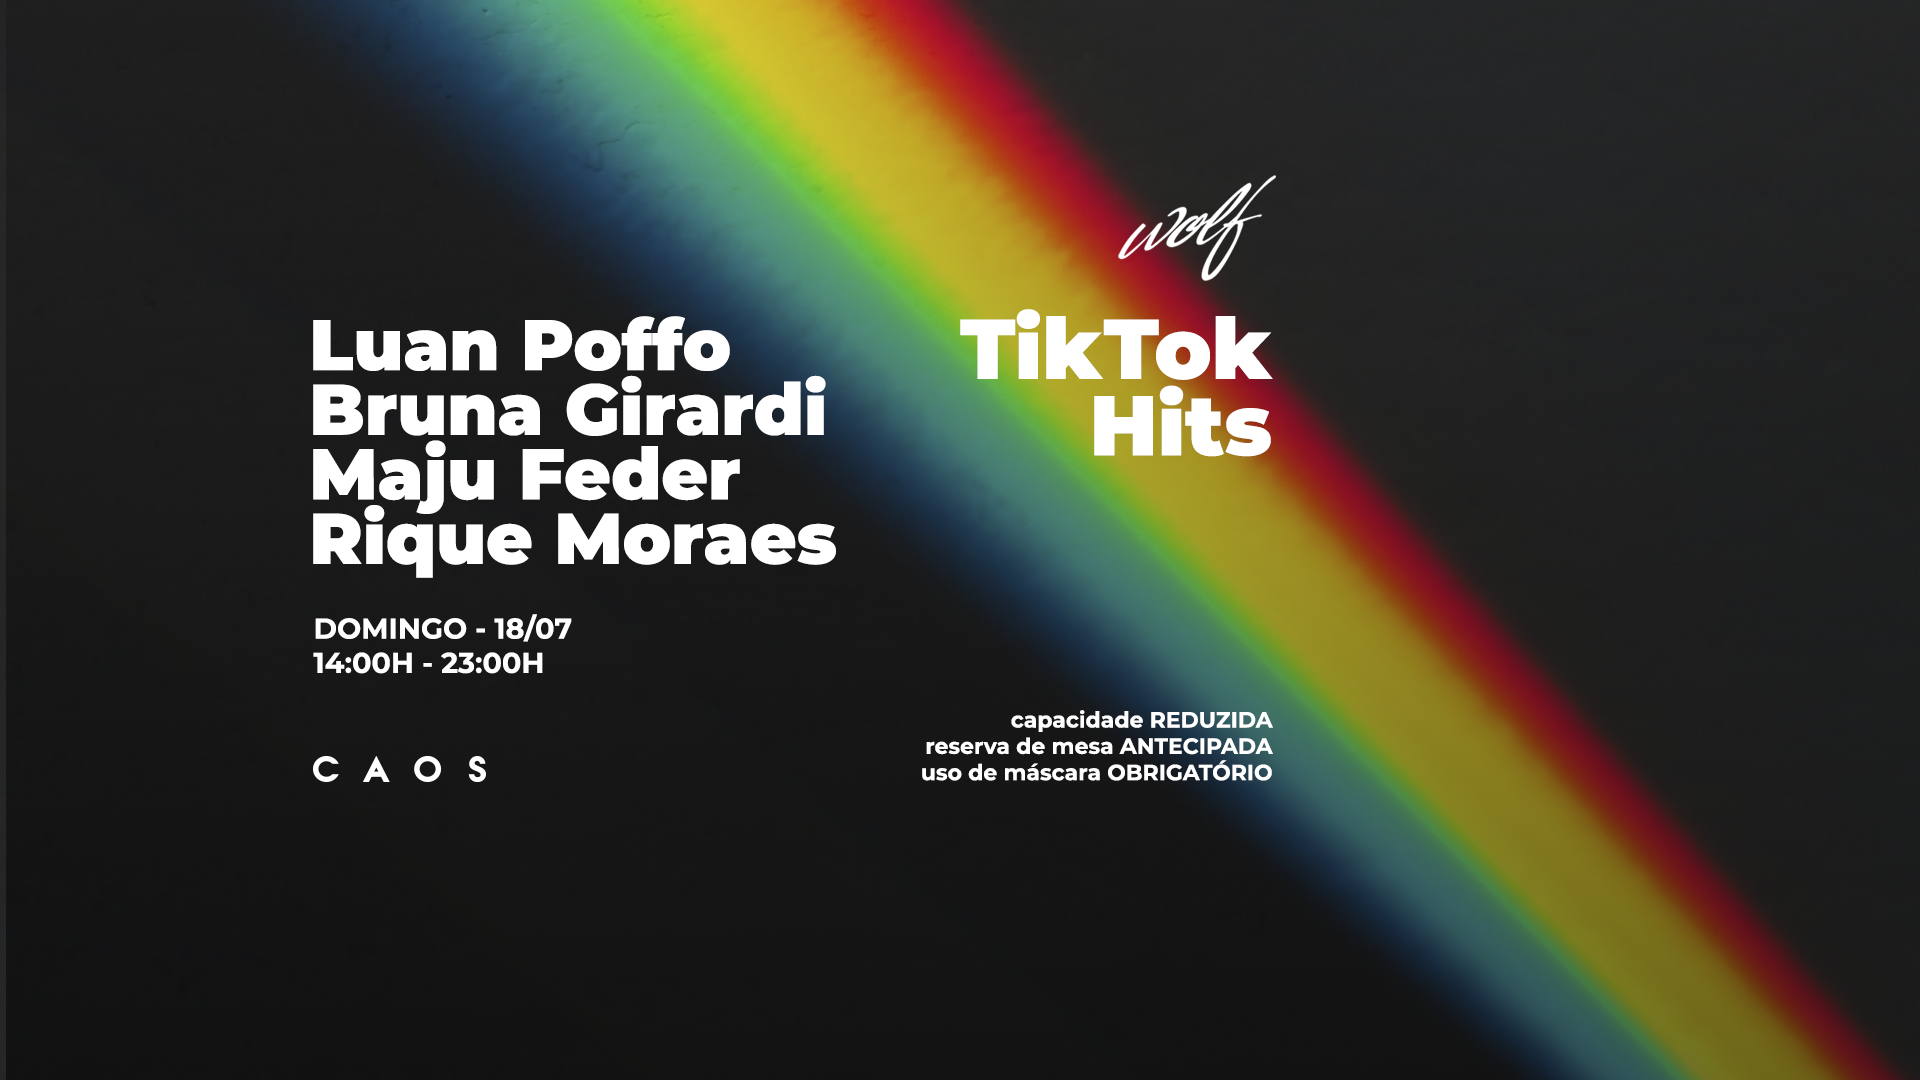 Wolf TikTok Hits com Luan Poffo